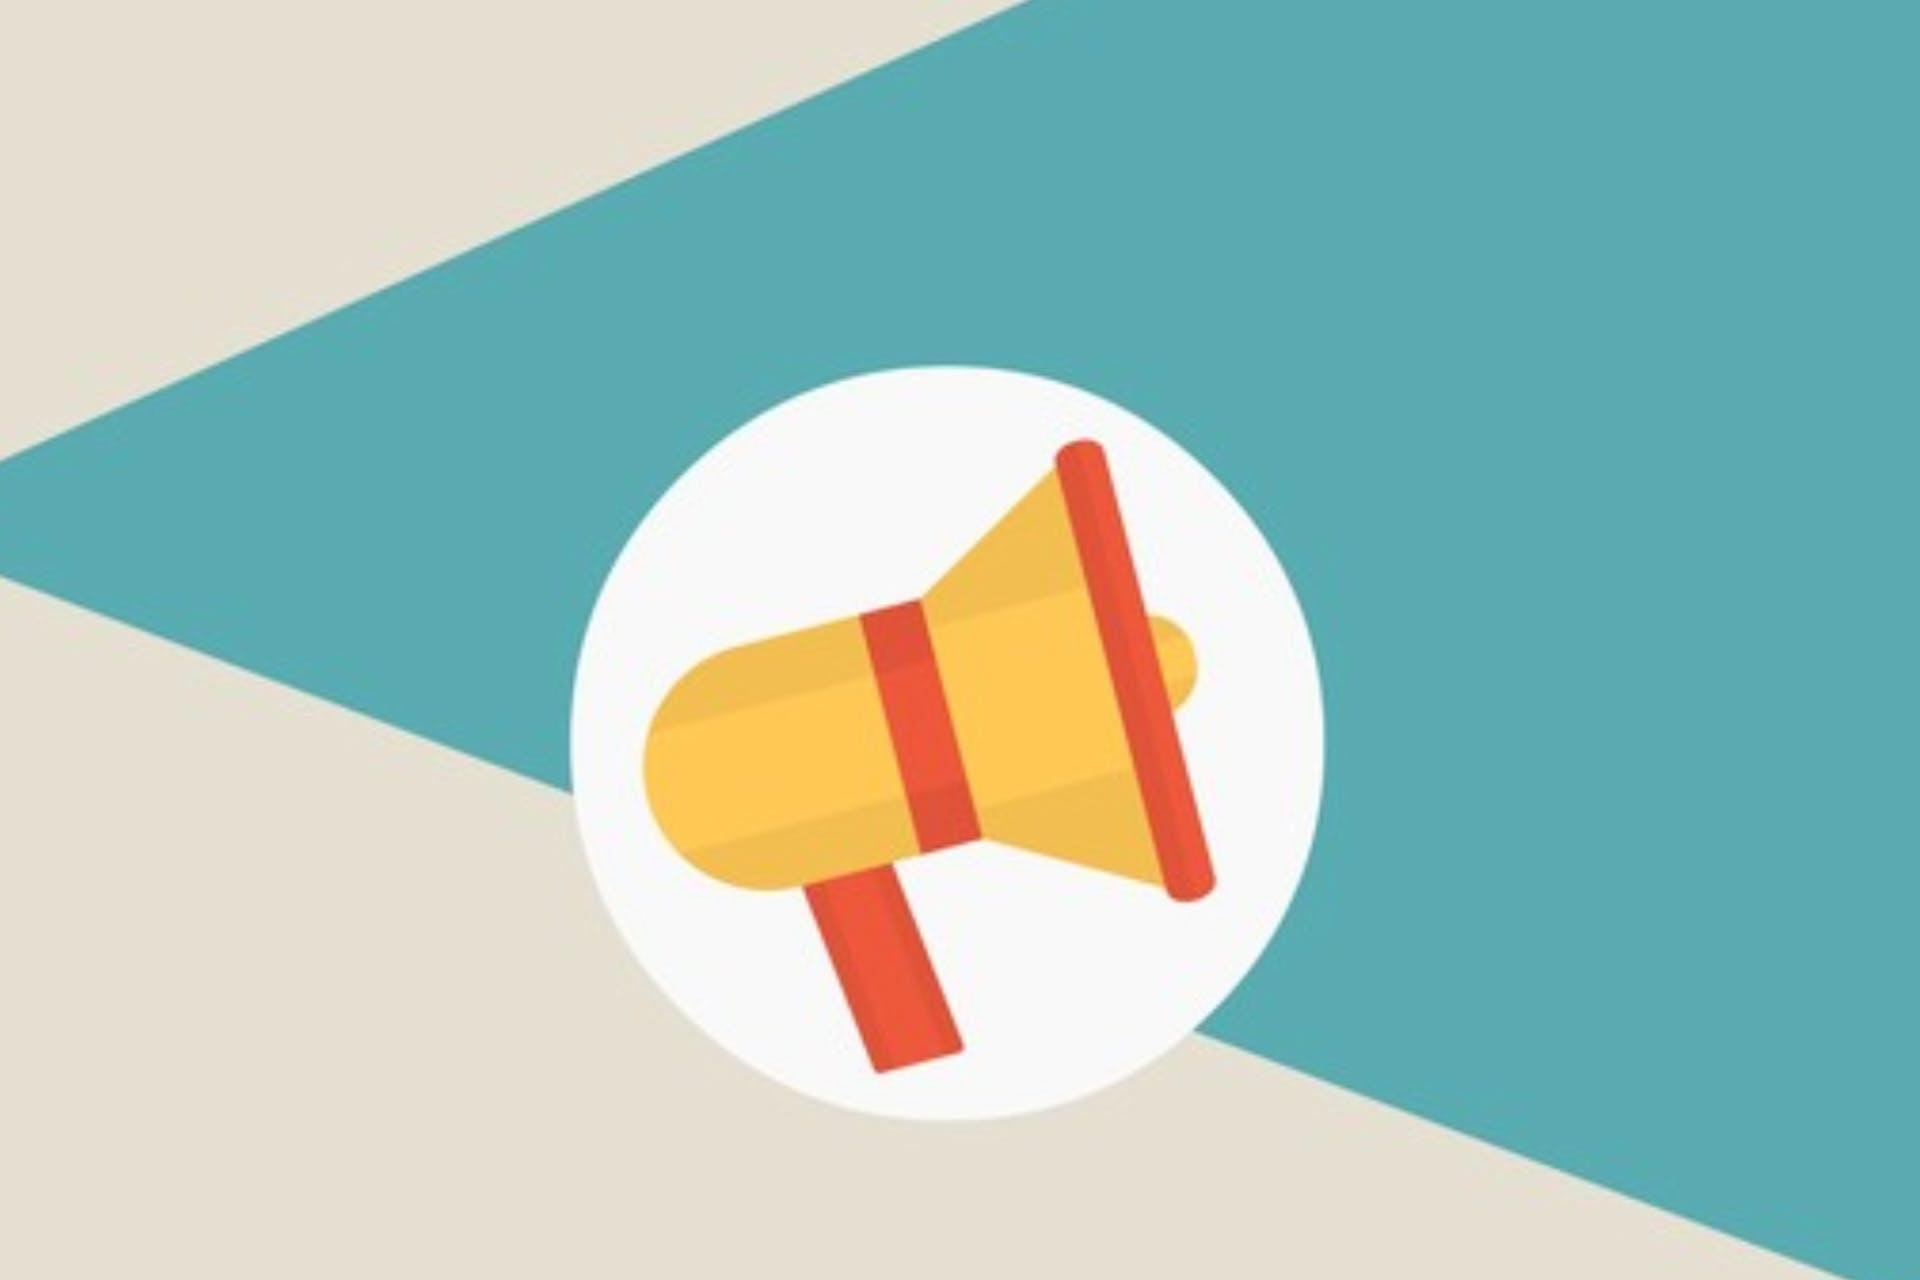 brand advocacy illustration megaphone